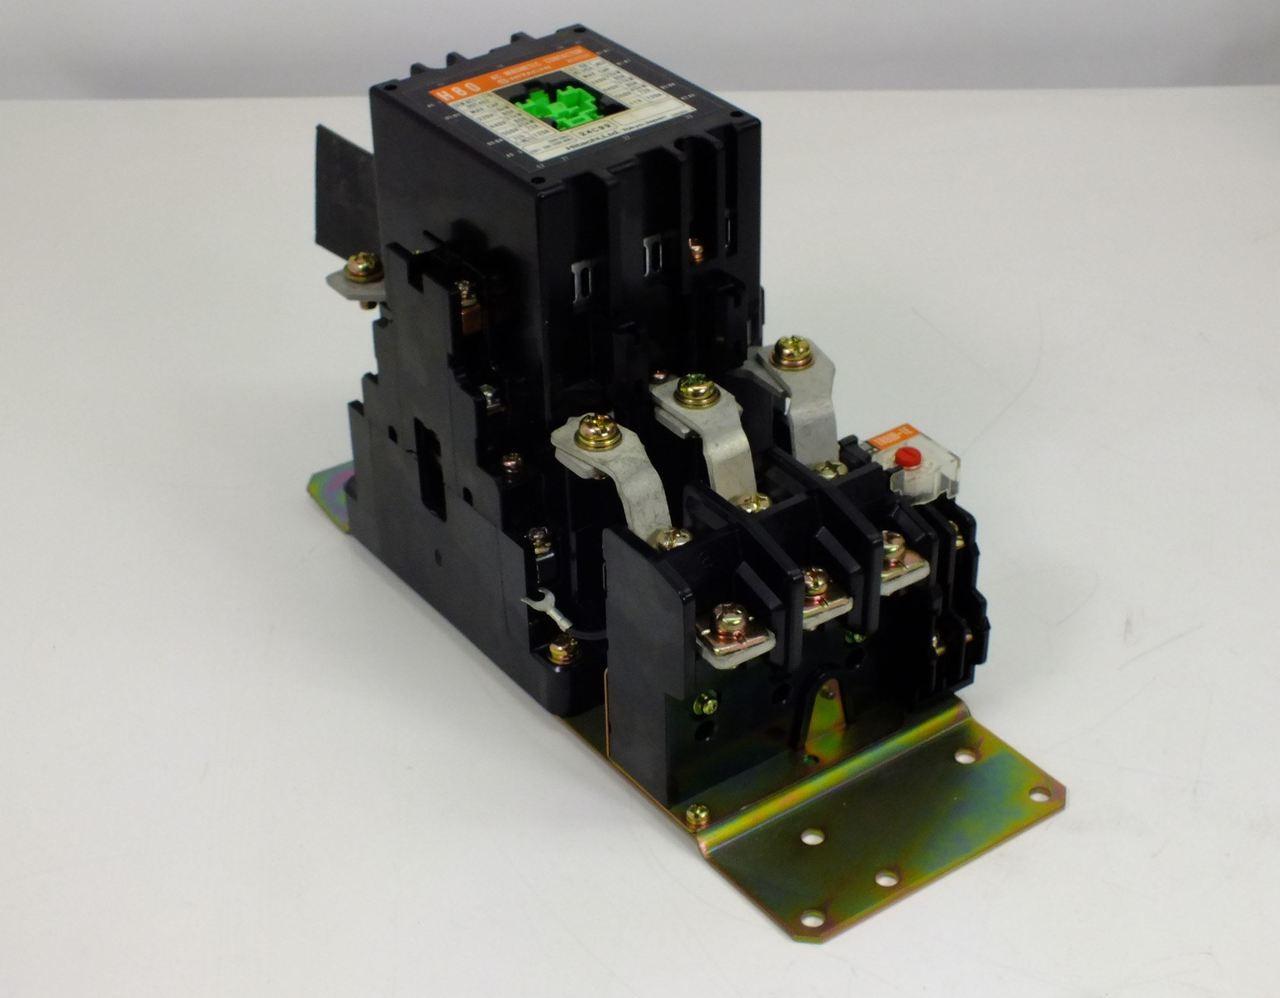 Smith jones electric motor wiring diagram smith jones for Smith and jones electric motors wiring diagram